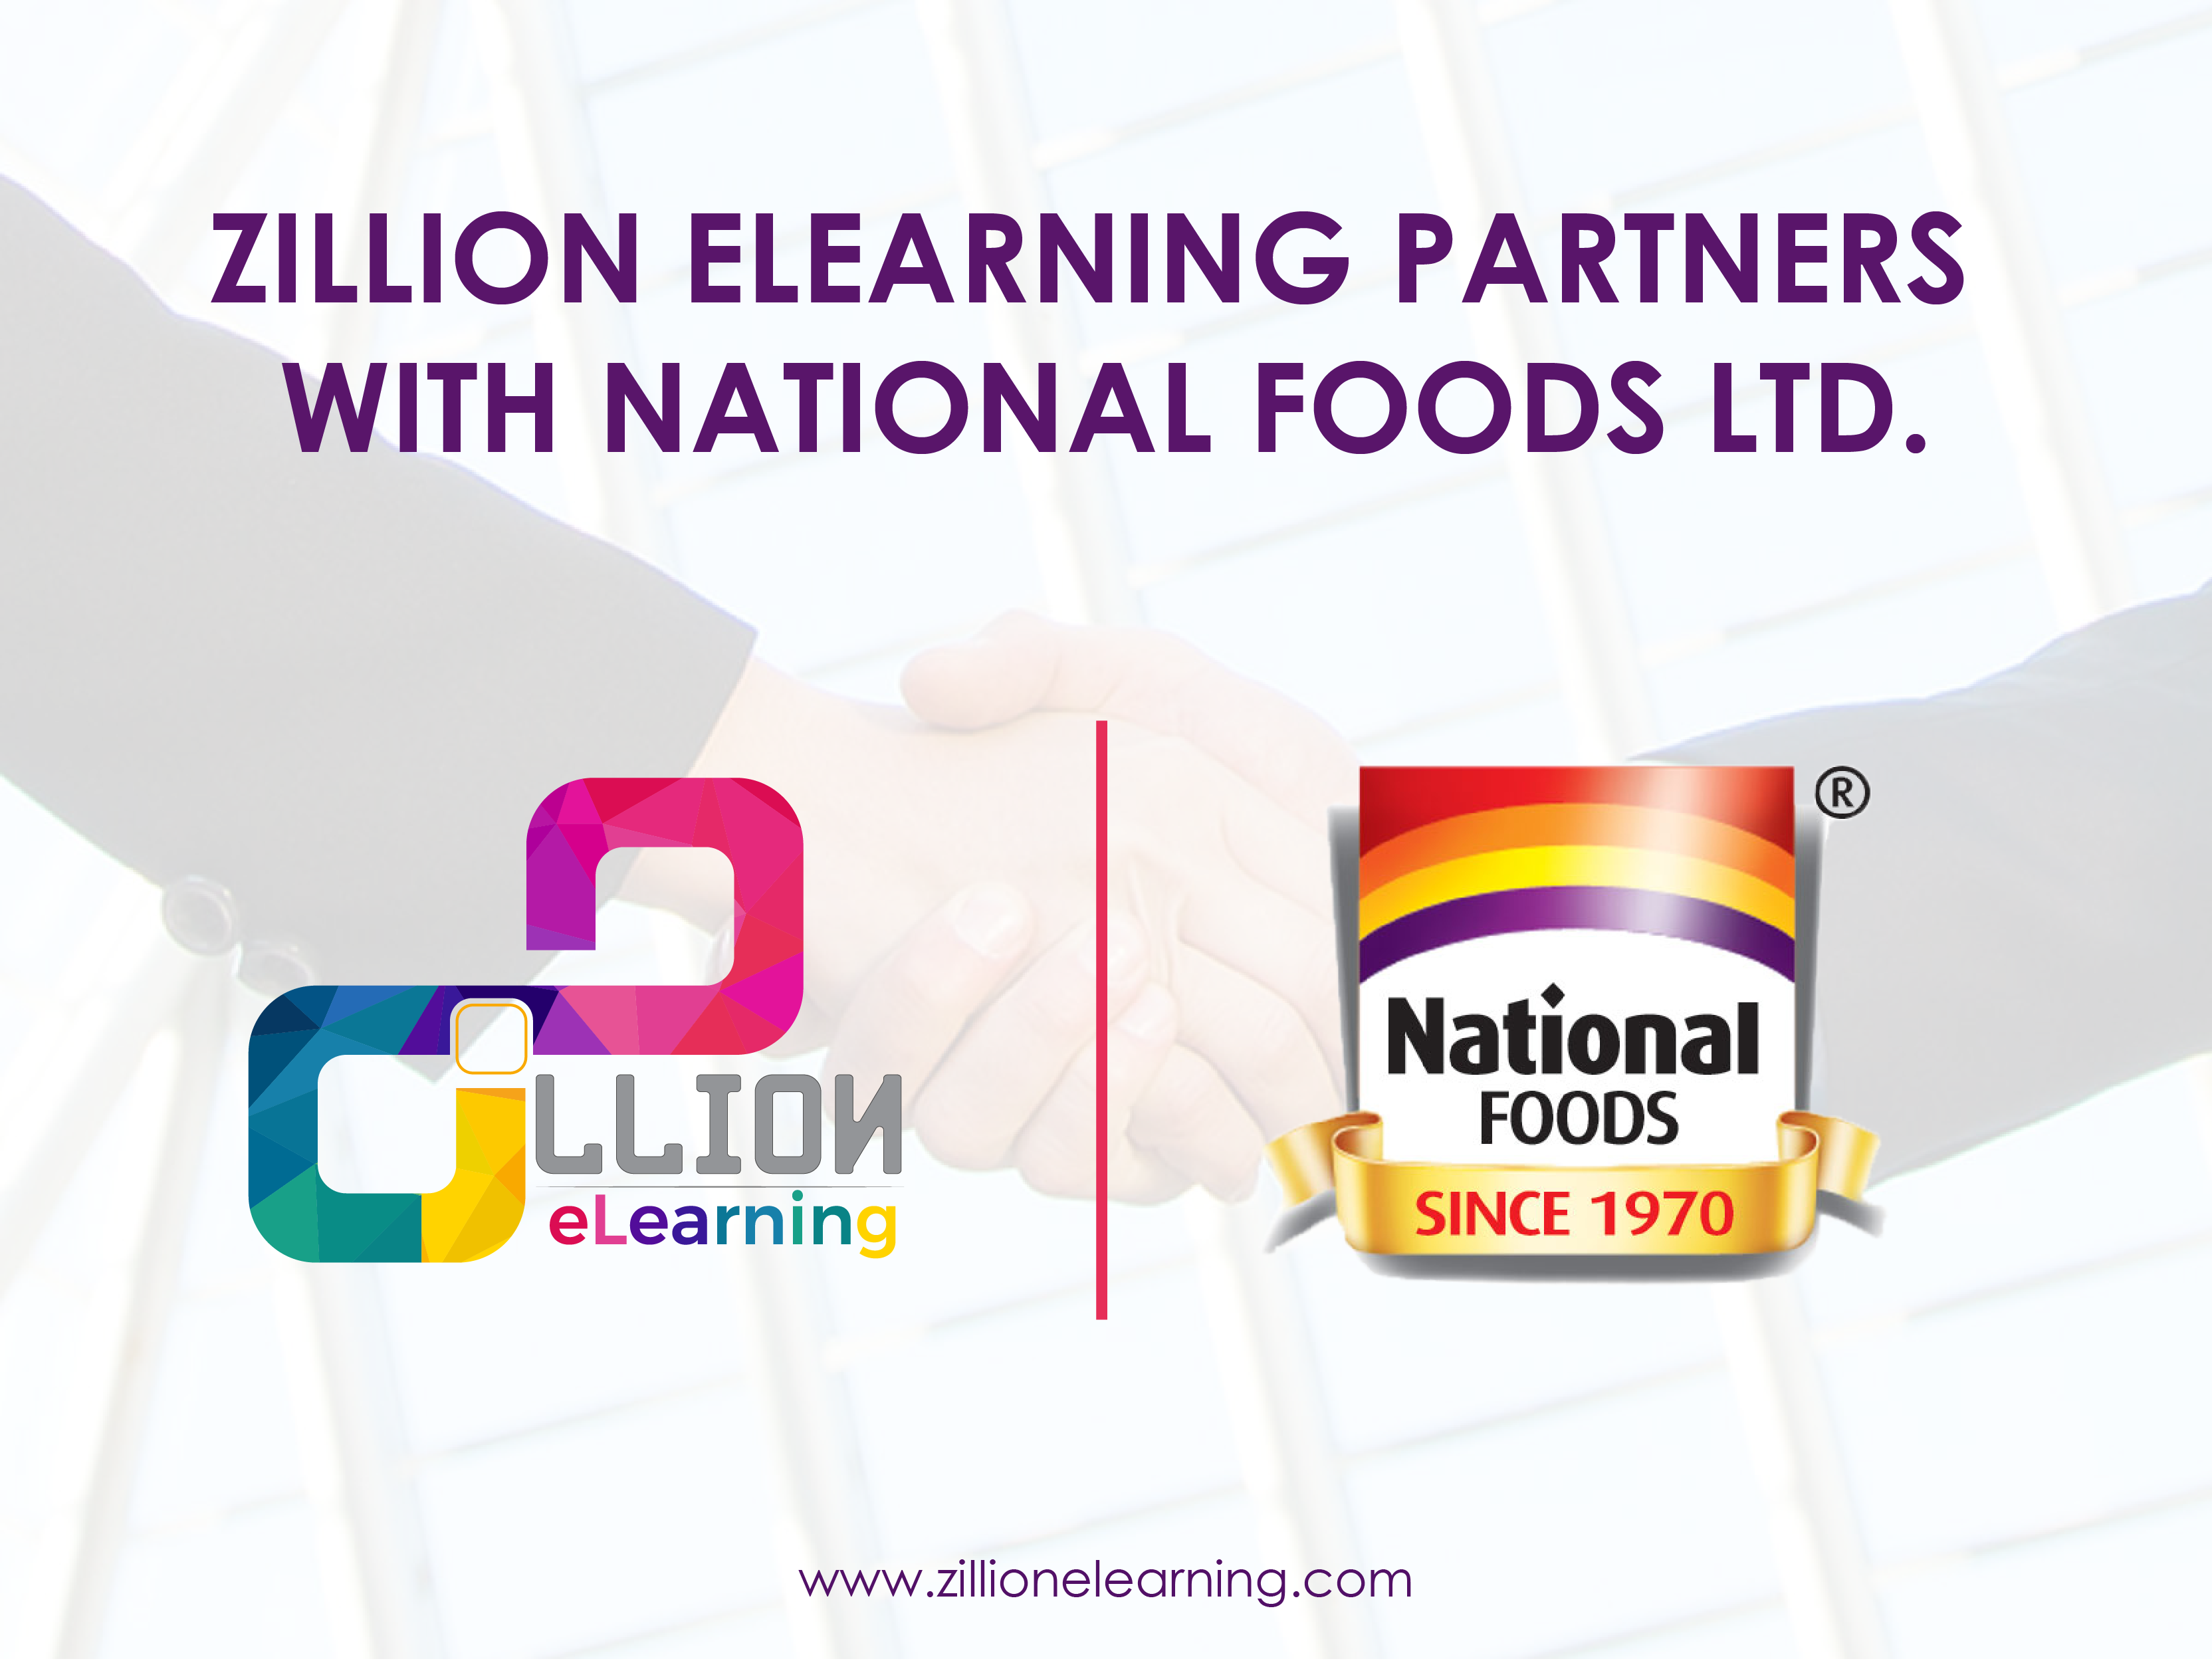 Zillion eLearning and National Foods ltd. Announces Strategic Partnership